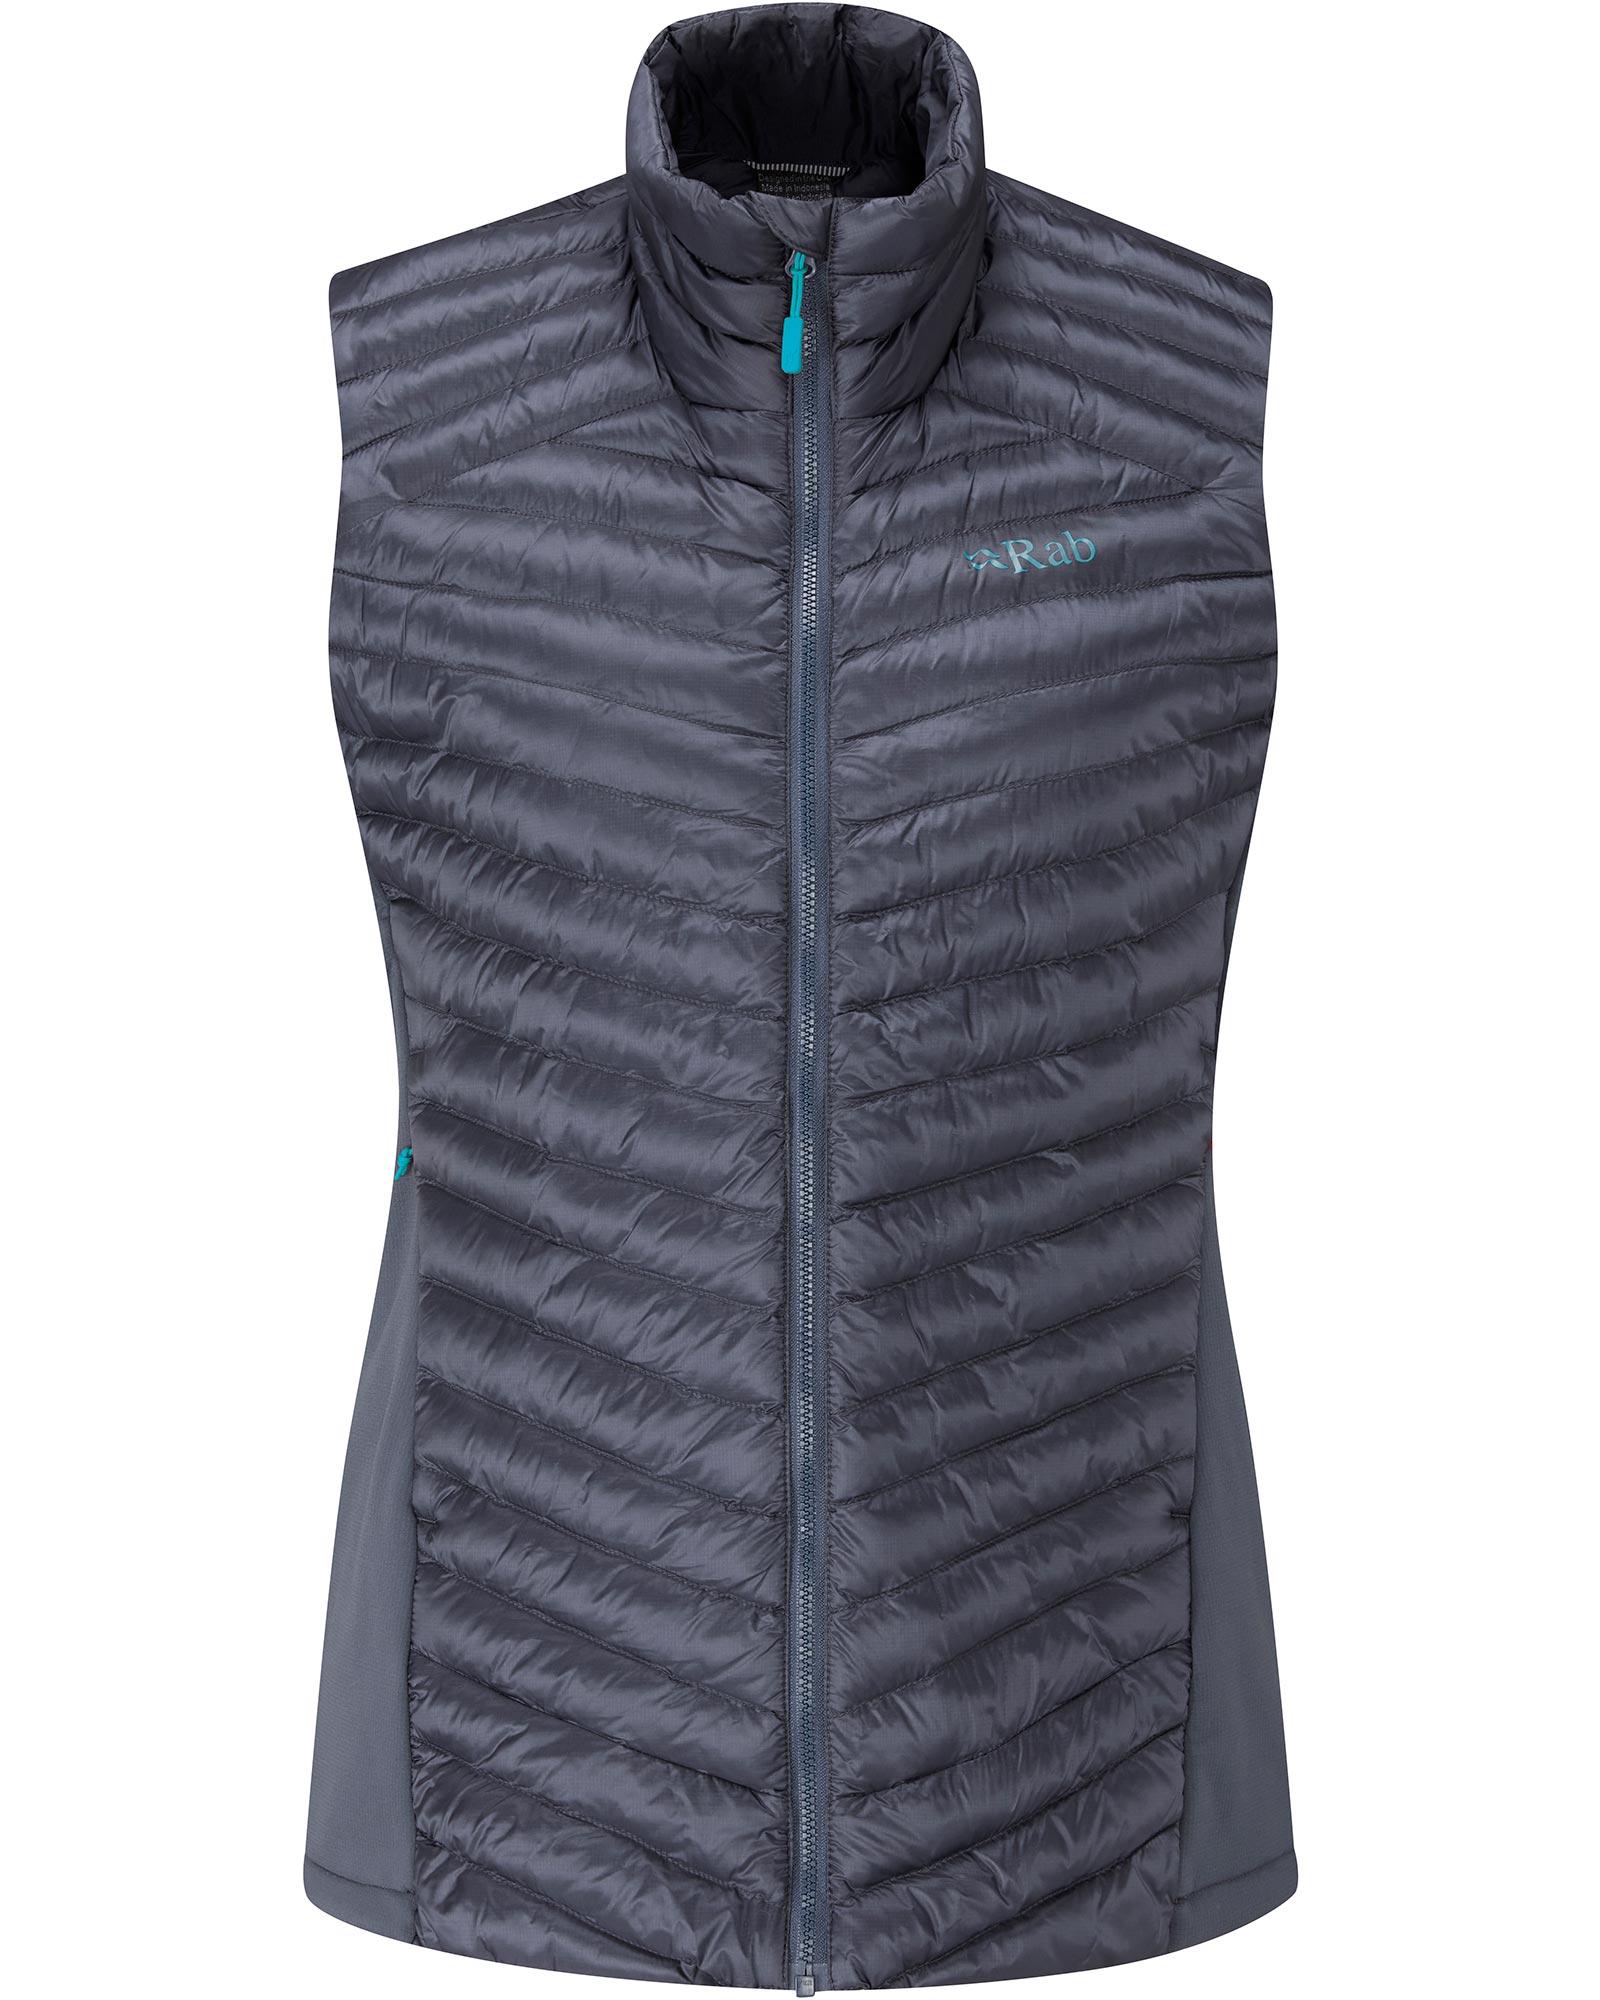 Rab Cirrus Flex 2.0 Women's Vest 0